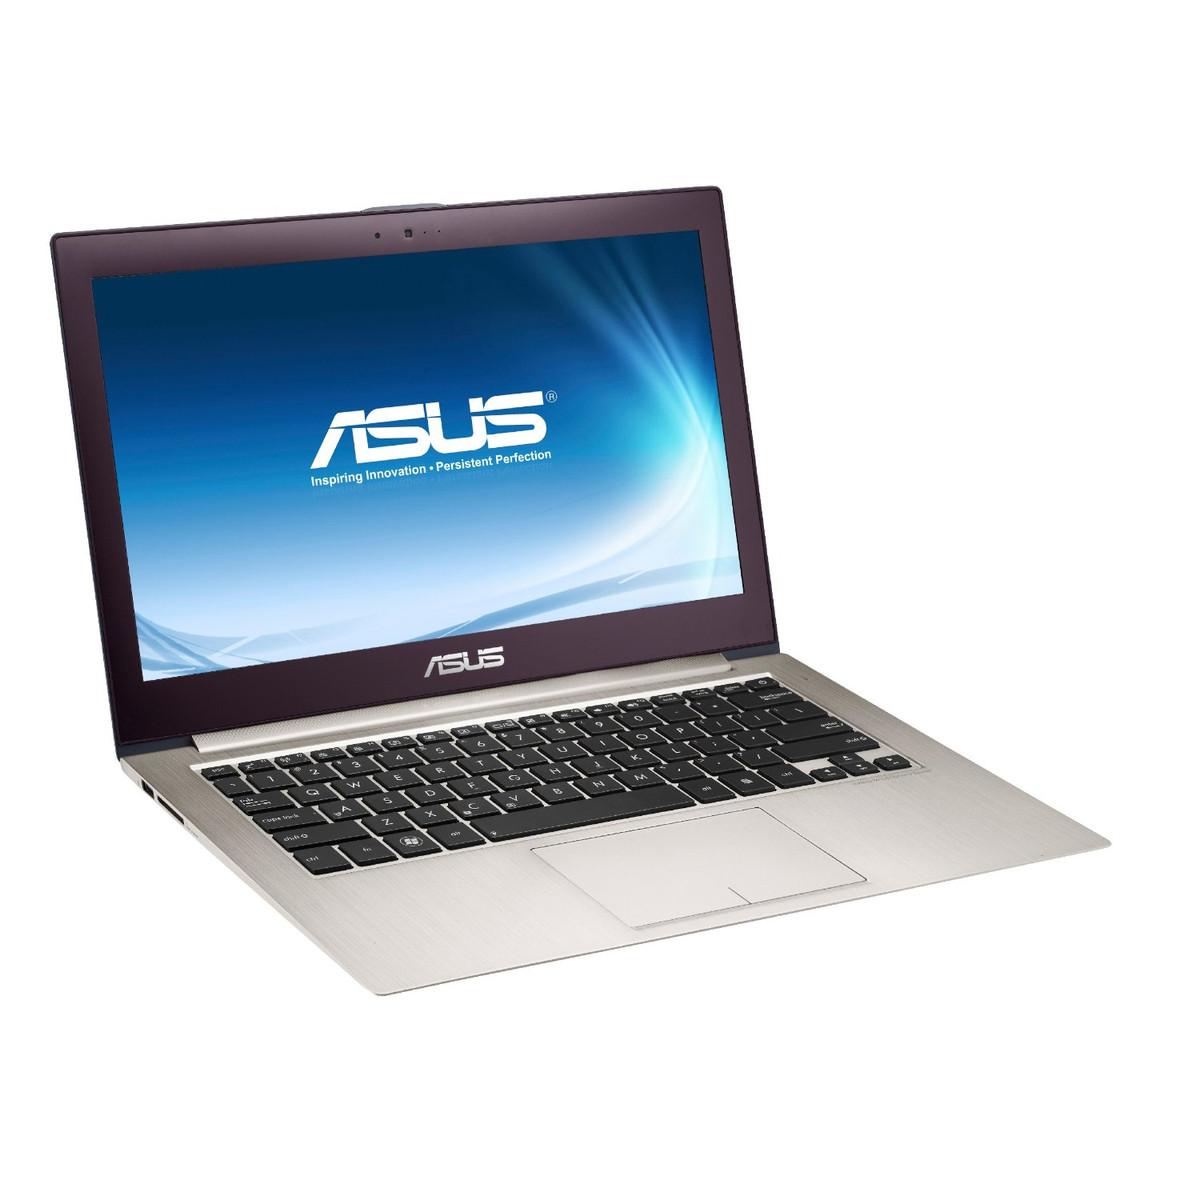 Notebook: Asus UX32A-R3007V ( Zenbook Prime UX Series )